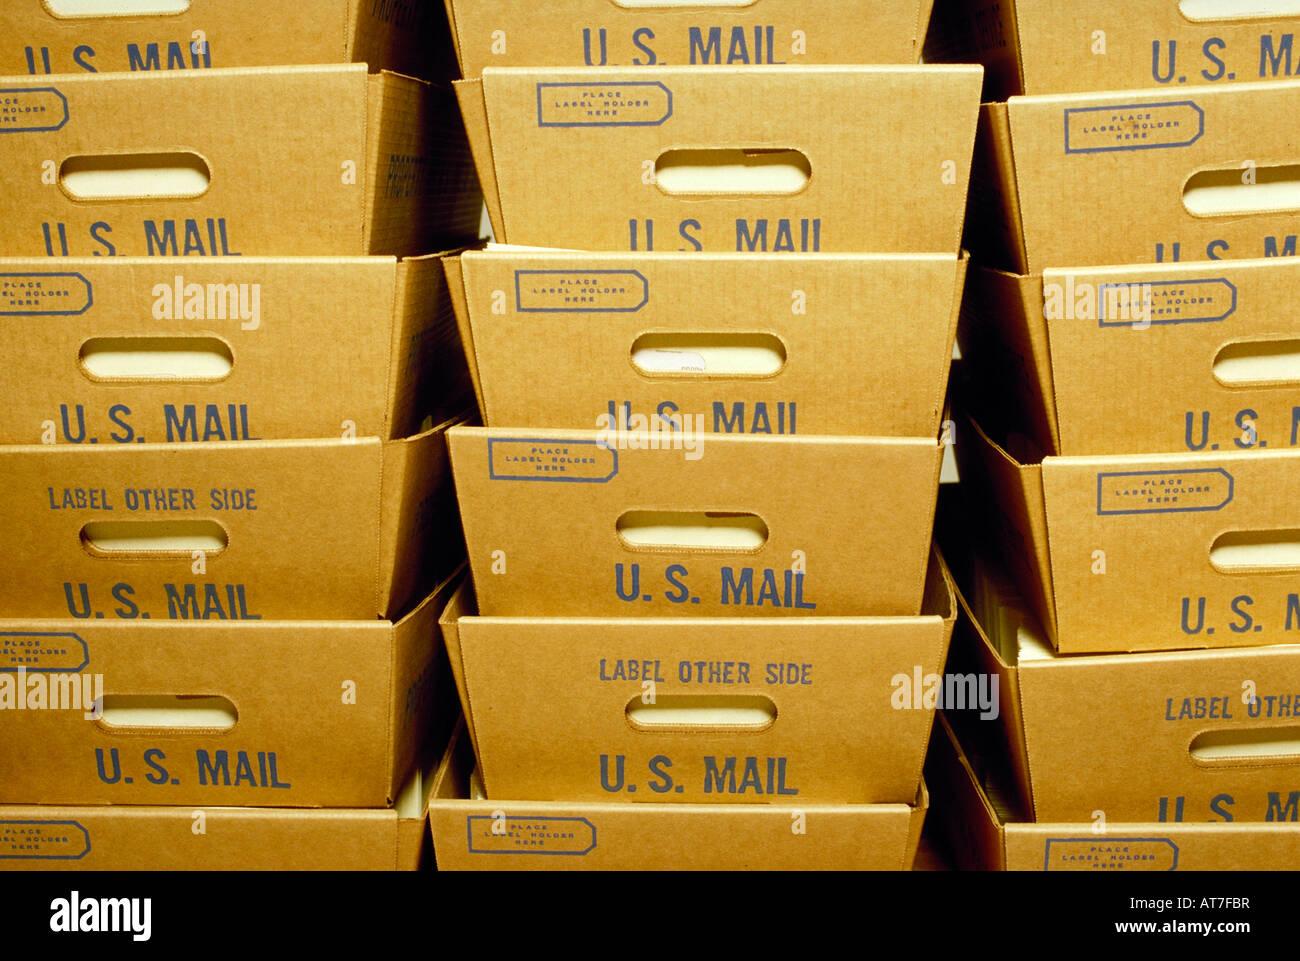 Cartons of US postal mail - Stock Image